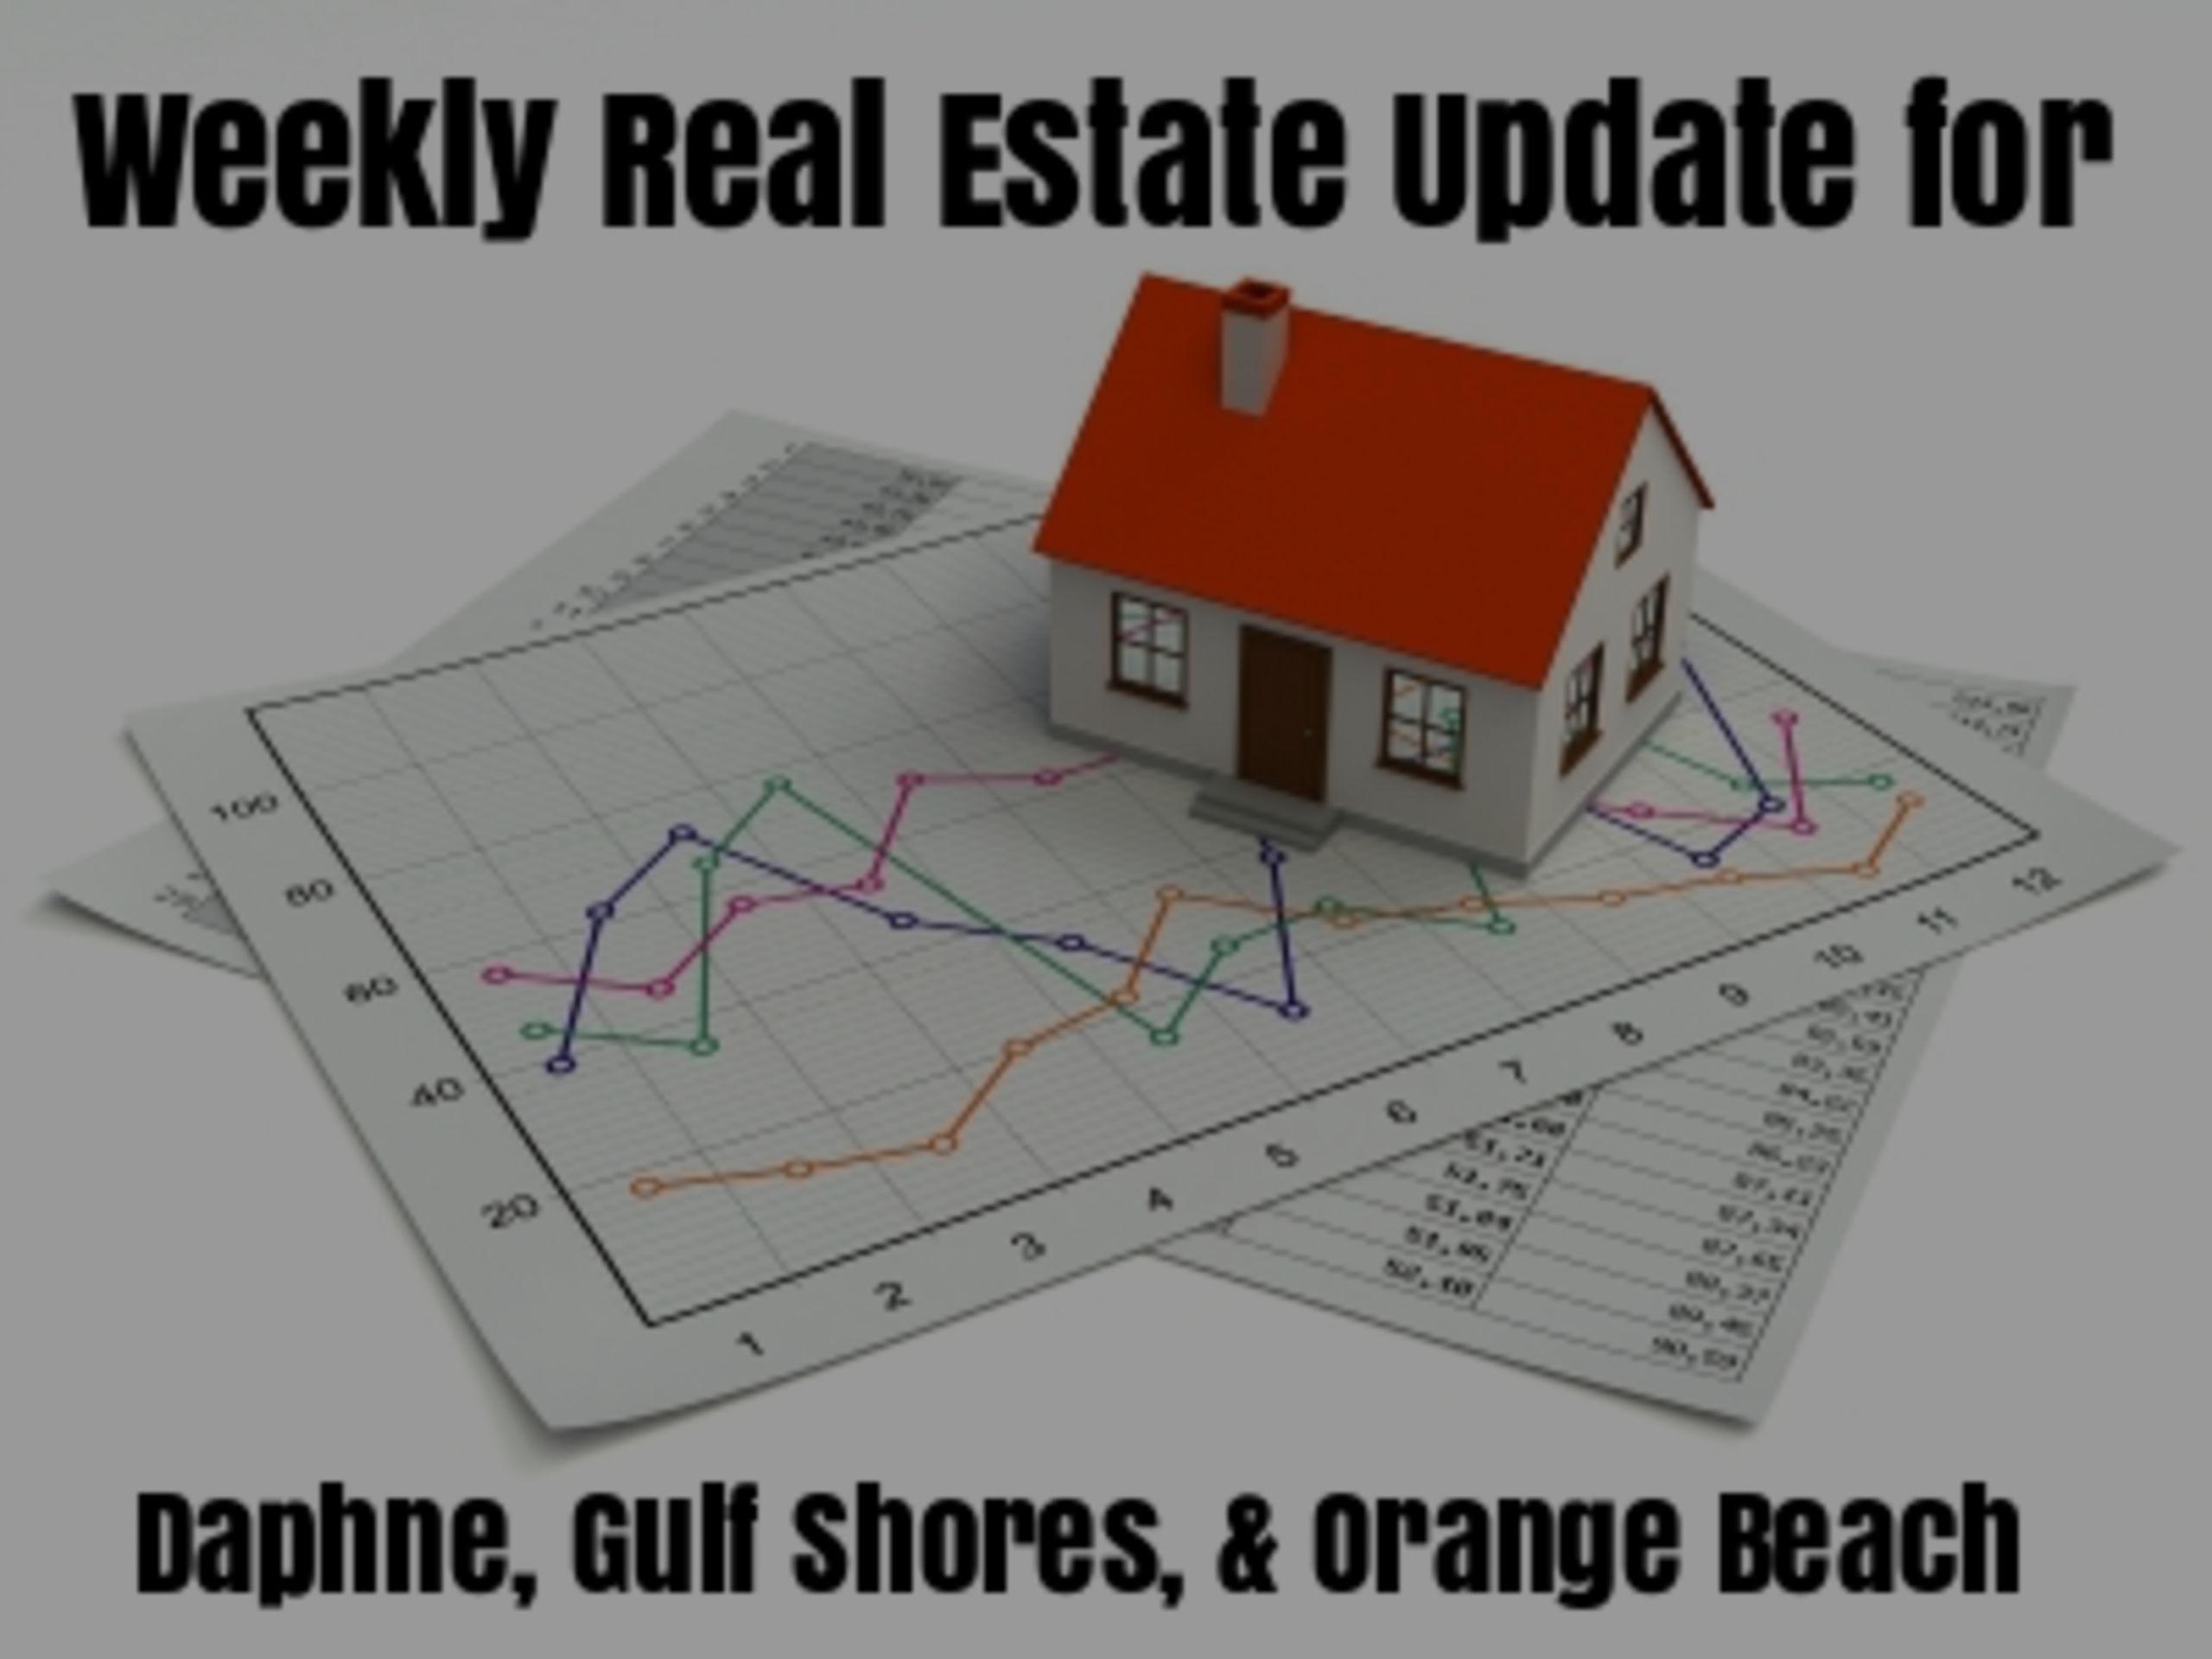 Weekly Real Estate Update – Daphne, Gulf Shores, and Orange Beach – 3/13/17